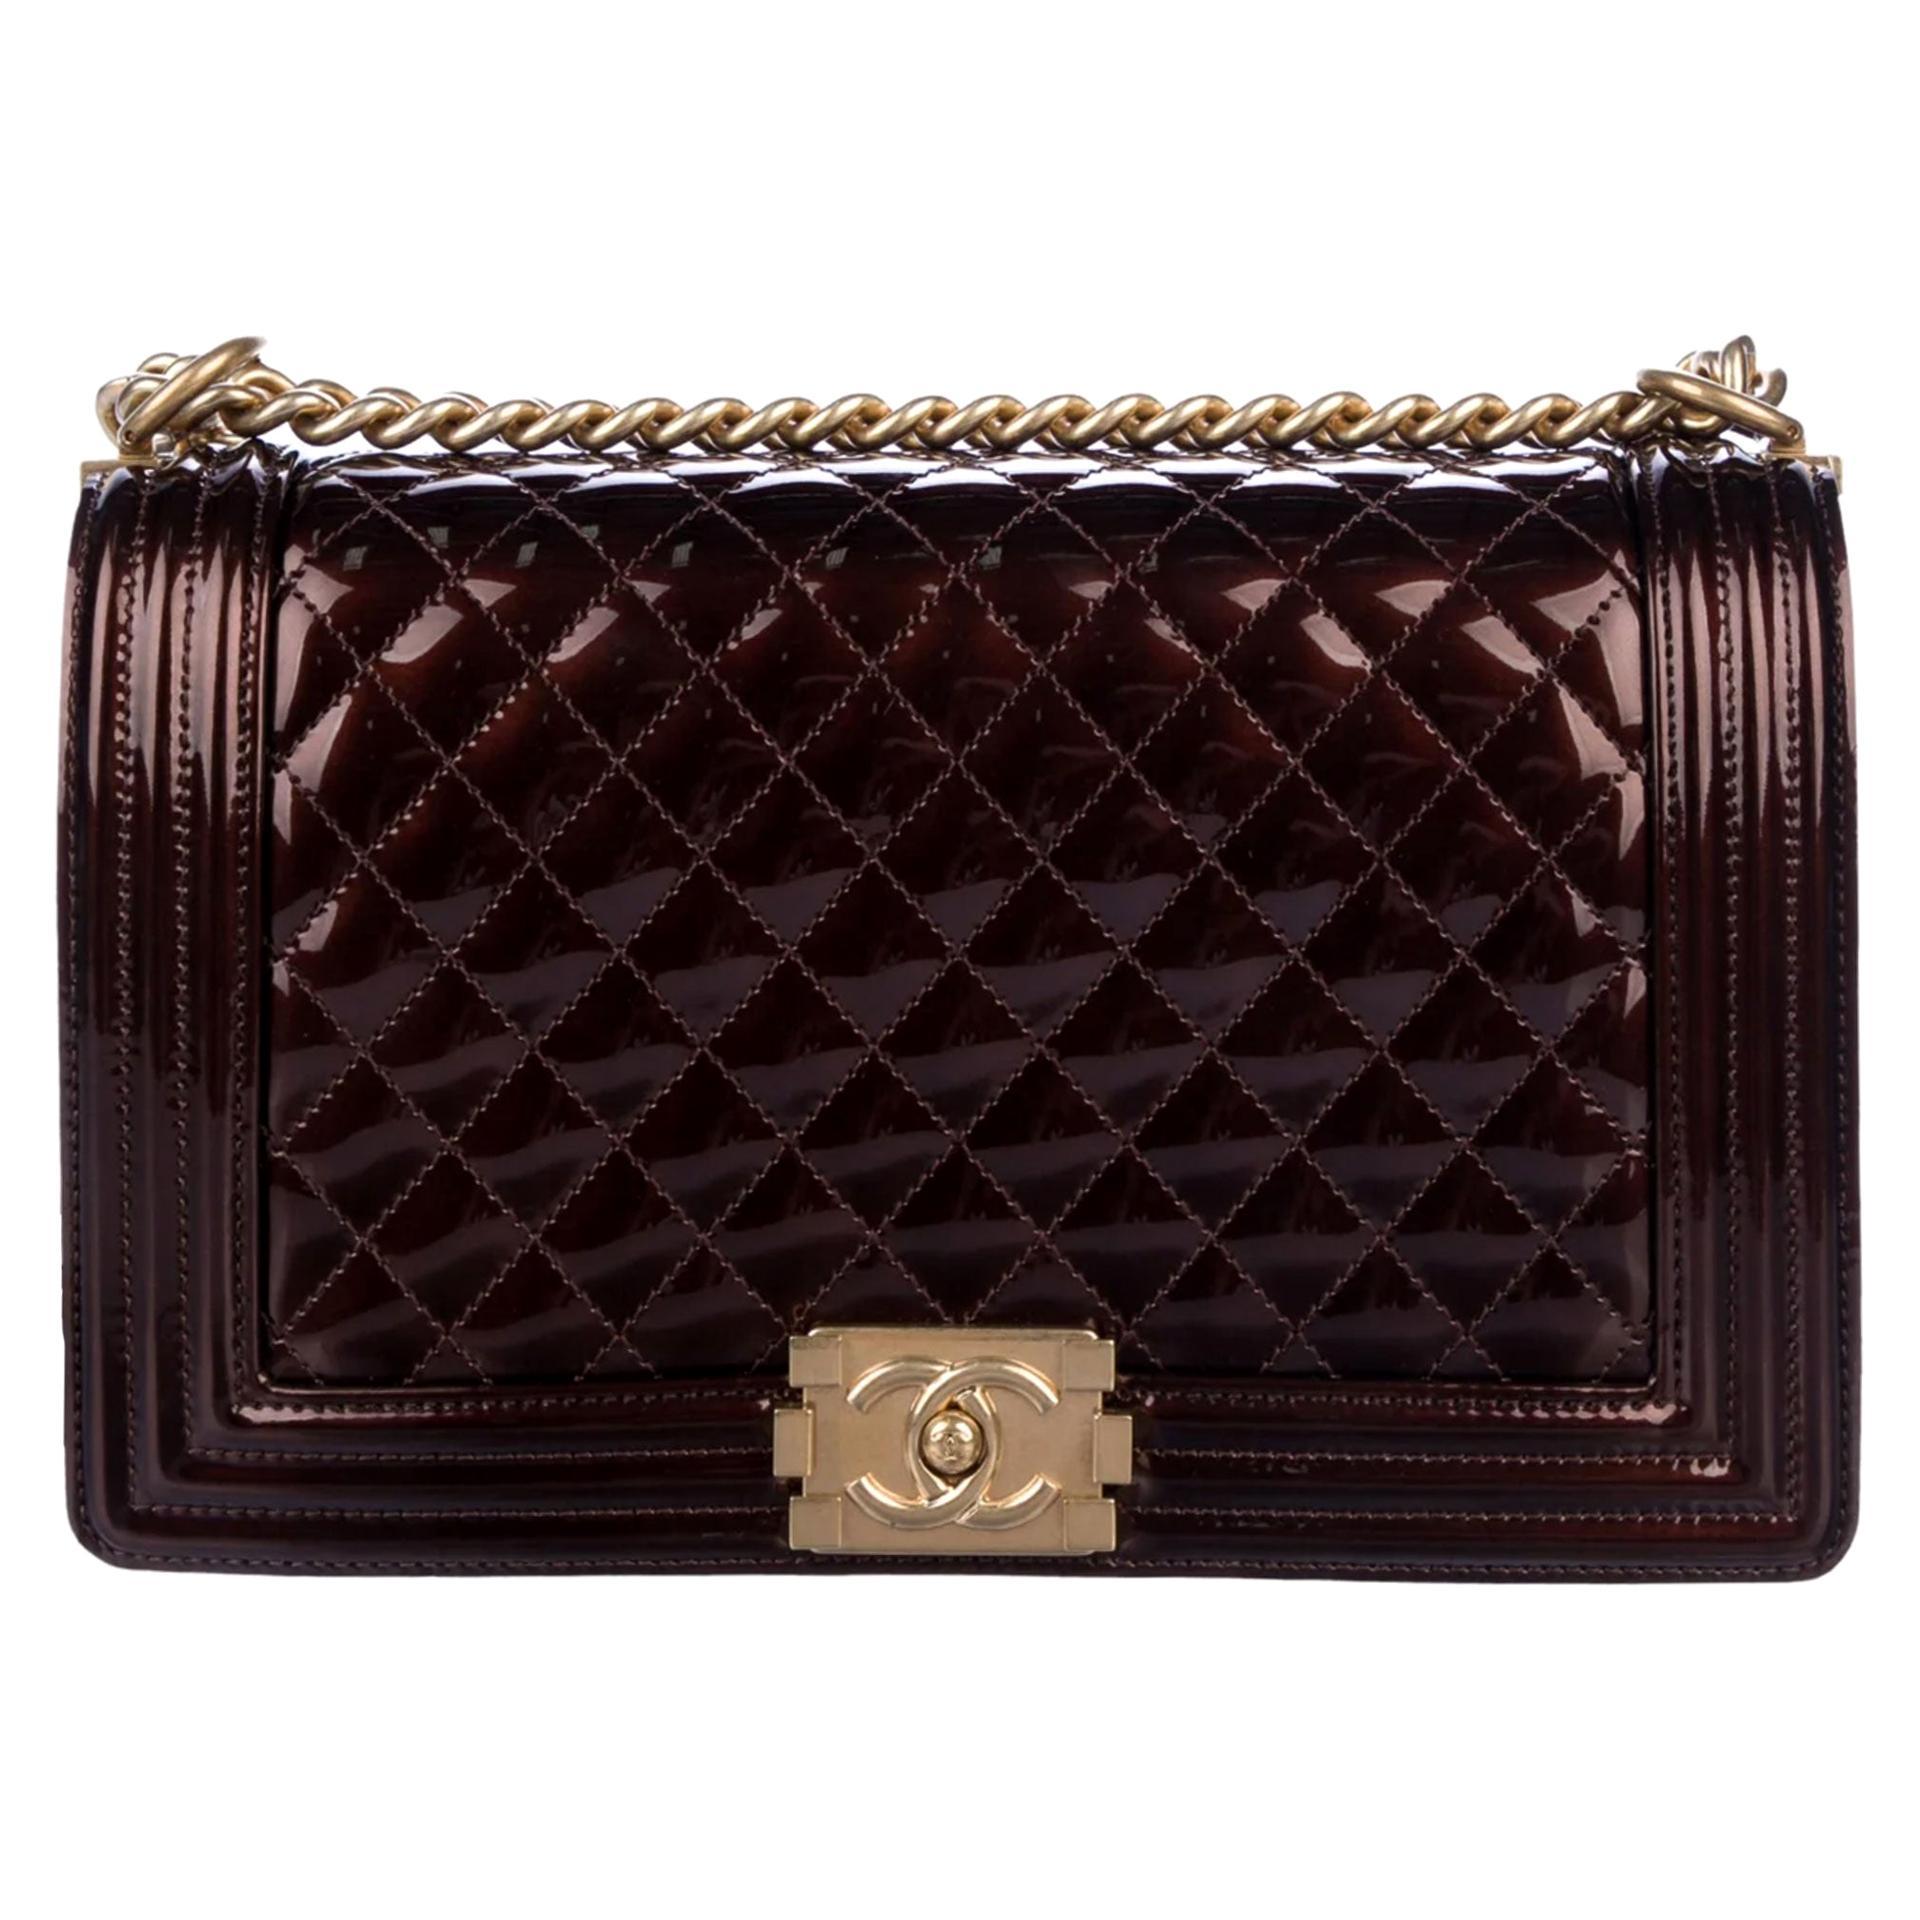 Chanel Rare Limited Edition Metallic Bronze Large Brown Gold Boy Bag